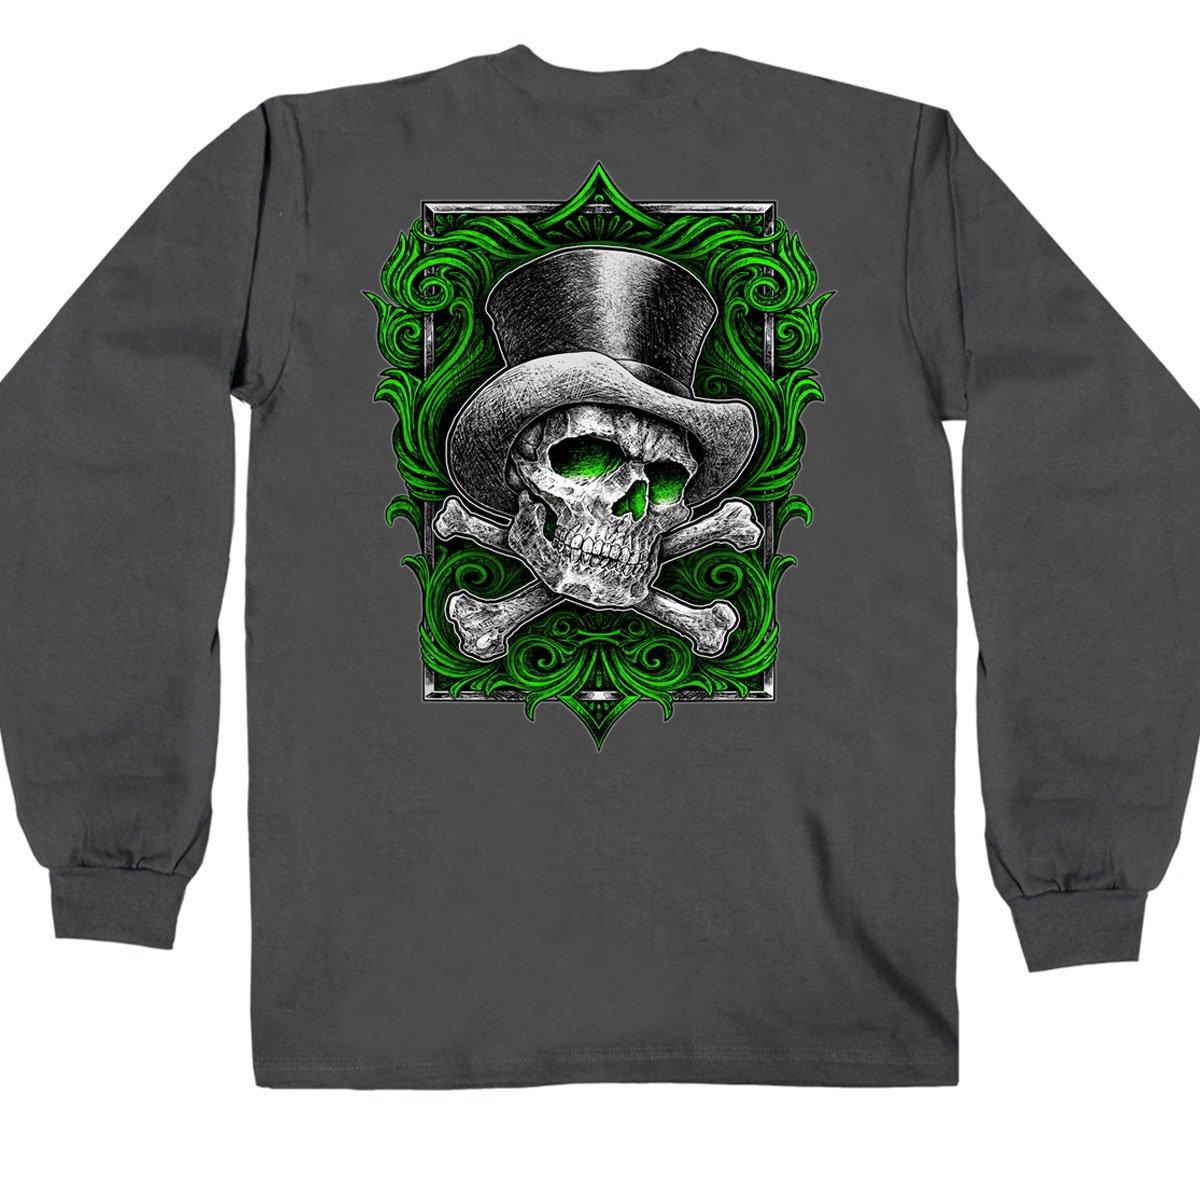 Hot Leathers Men's Top Hat Cross Bones Long Sleeve Shirt (Charcoal, X-Large)